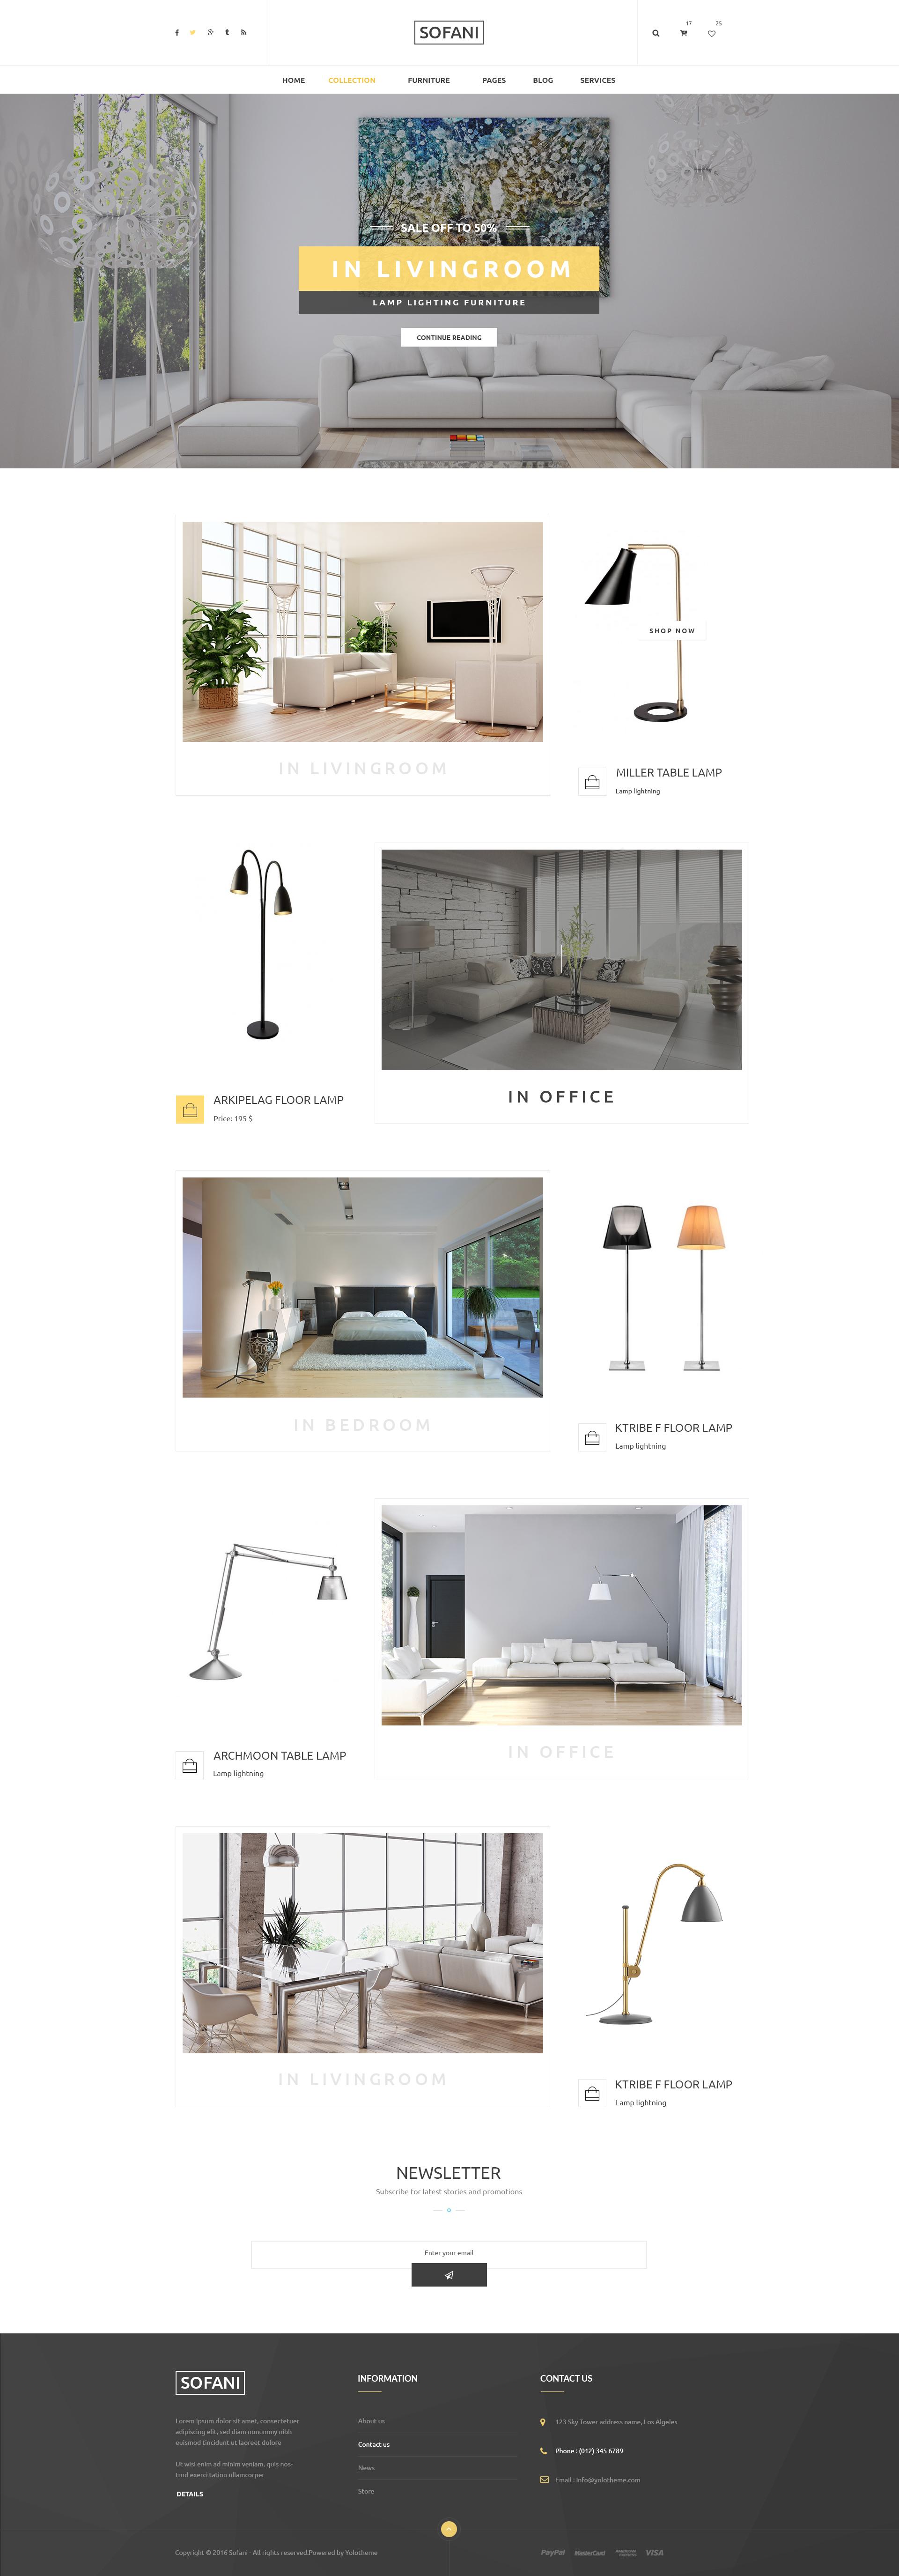 Sofani Furniture Store HTML Template by YoloPSD ThemeForest